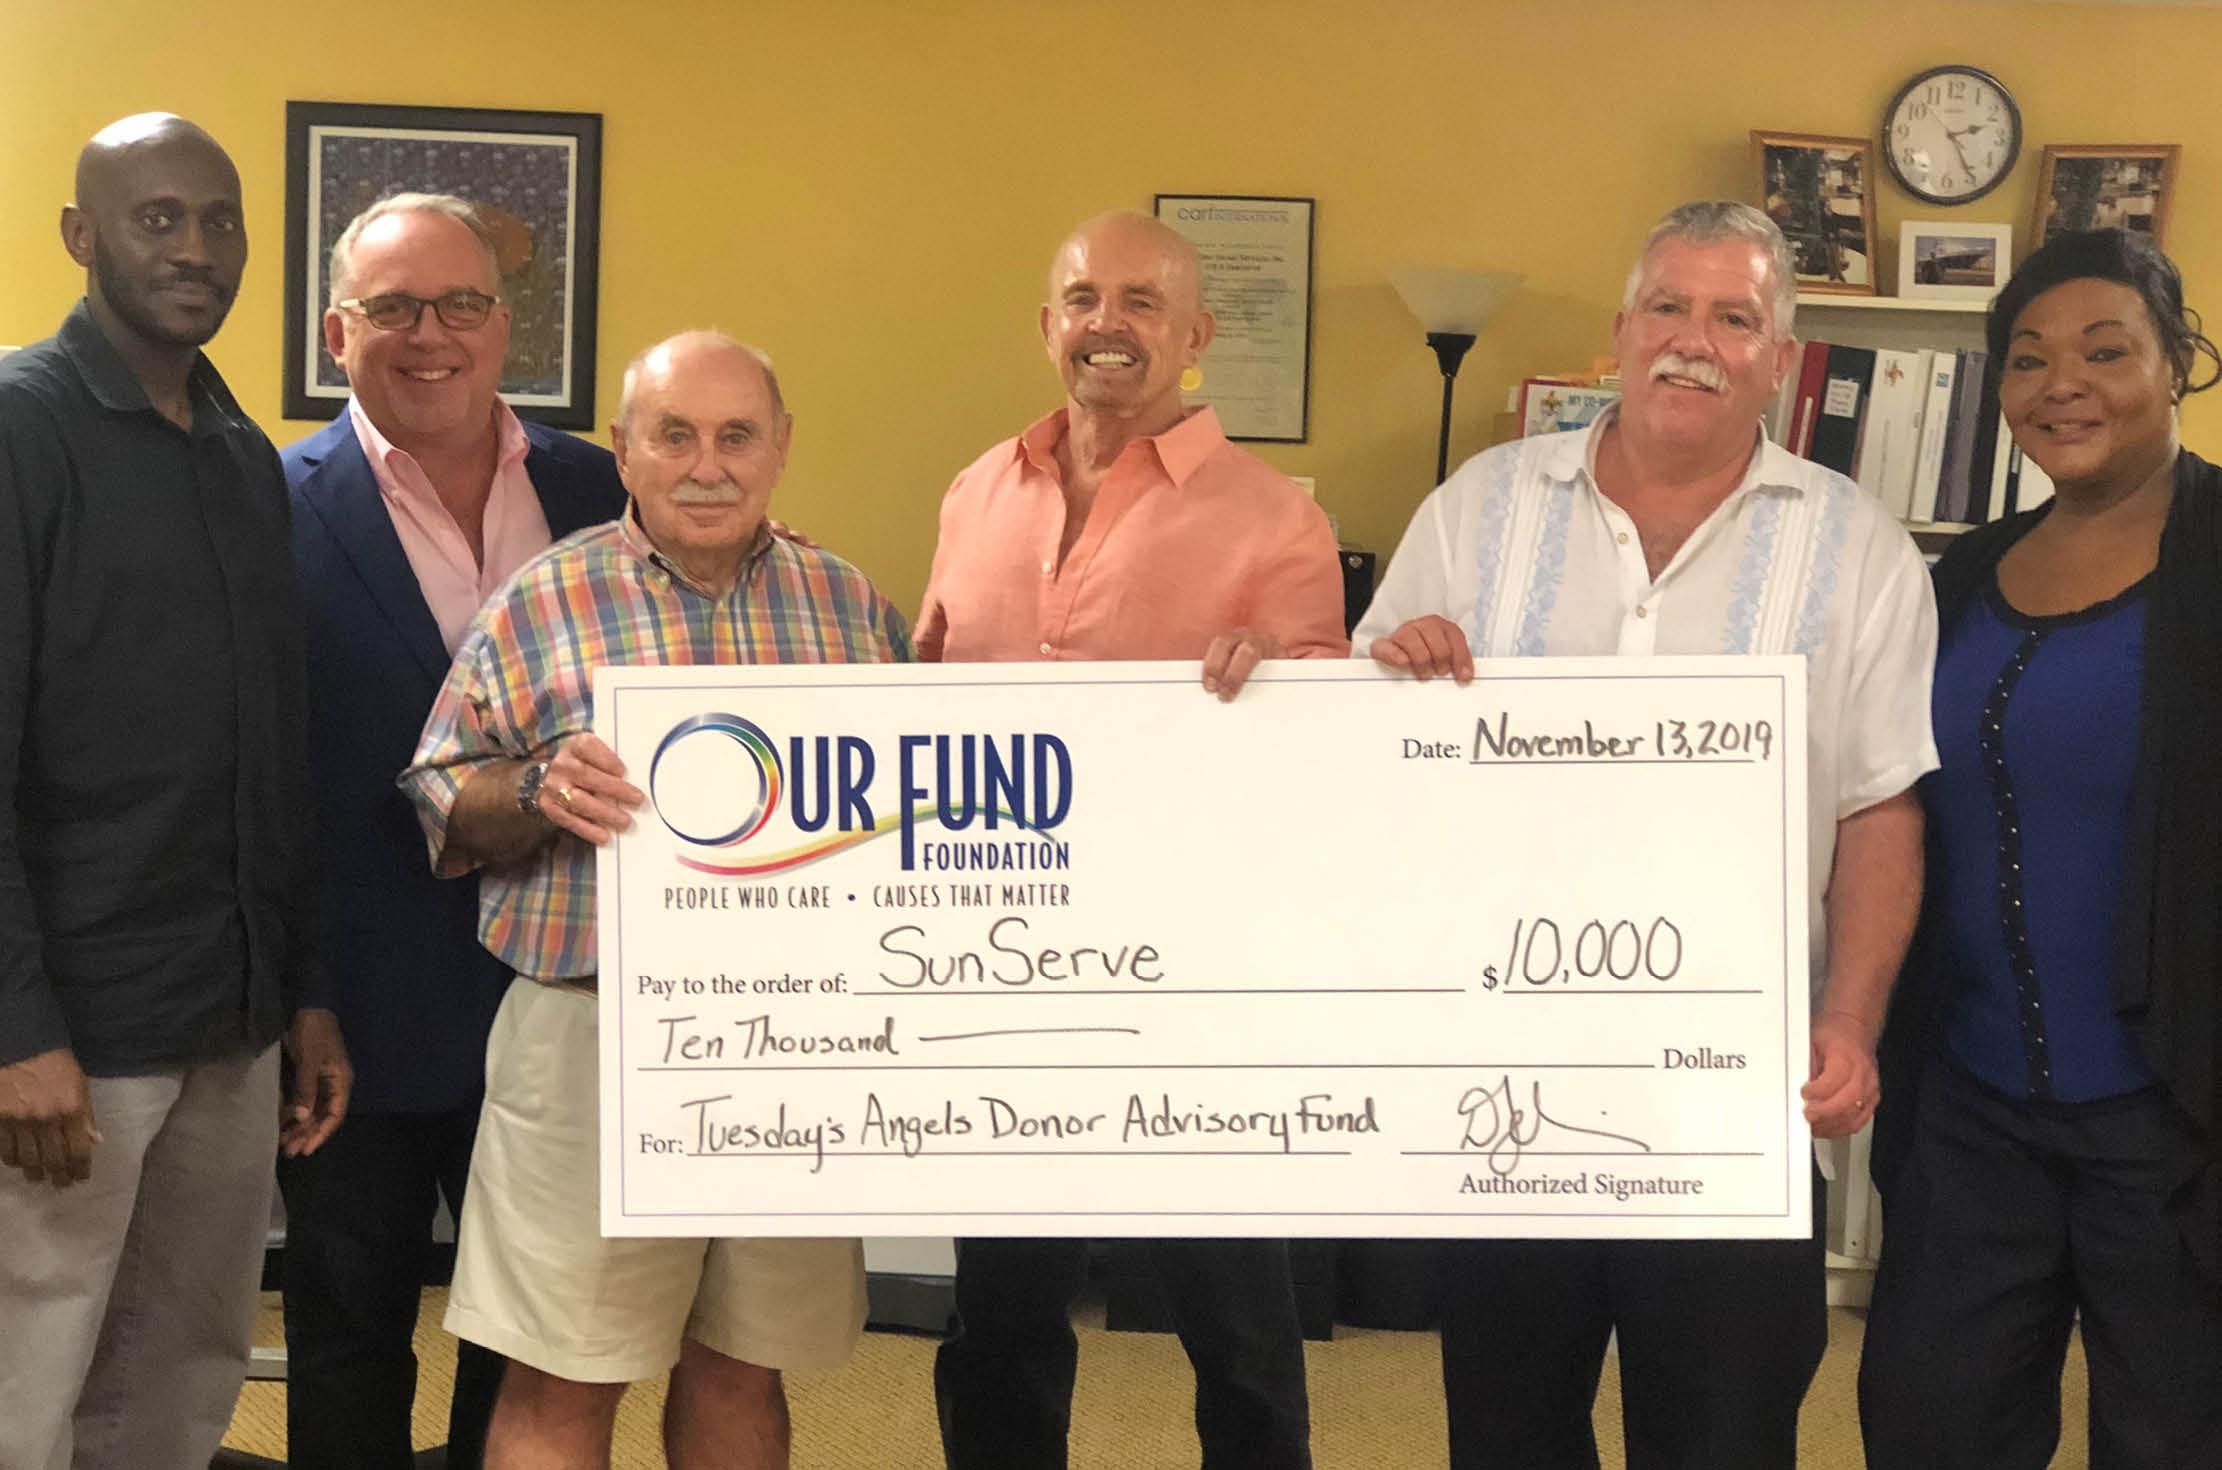 Tuesday's Angels Donates $25,000